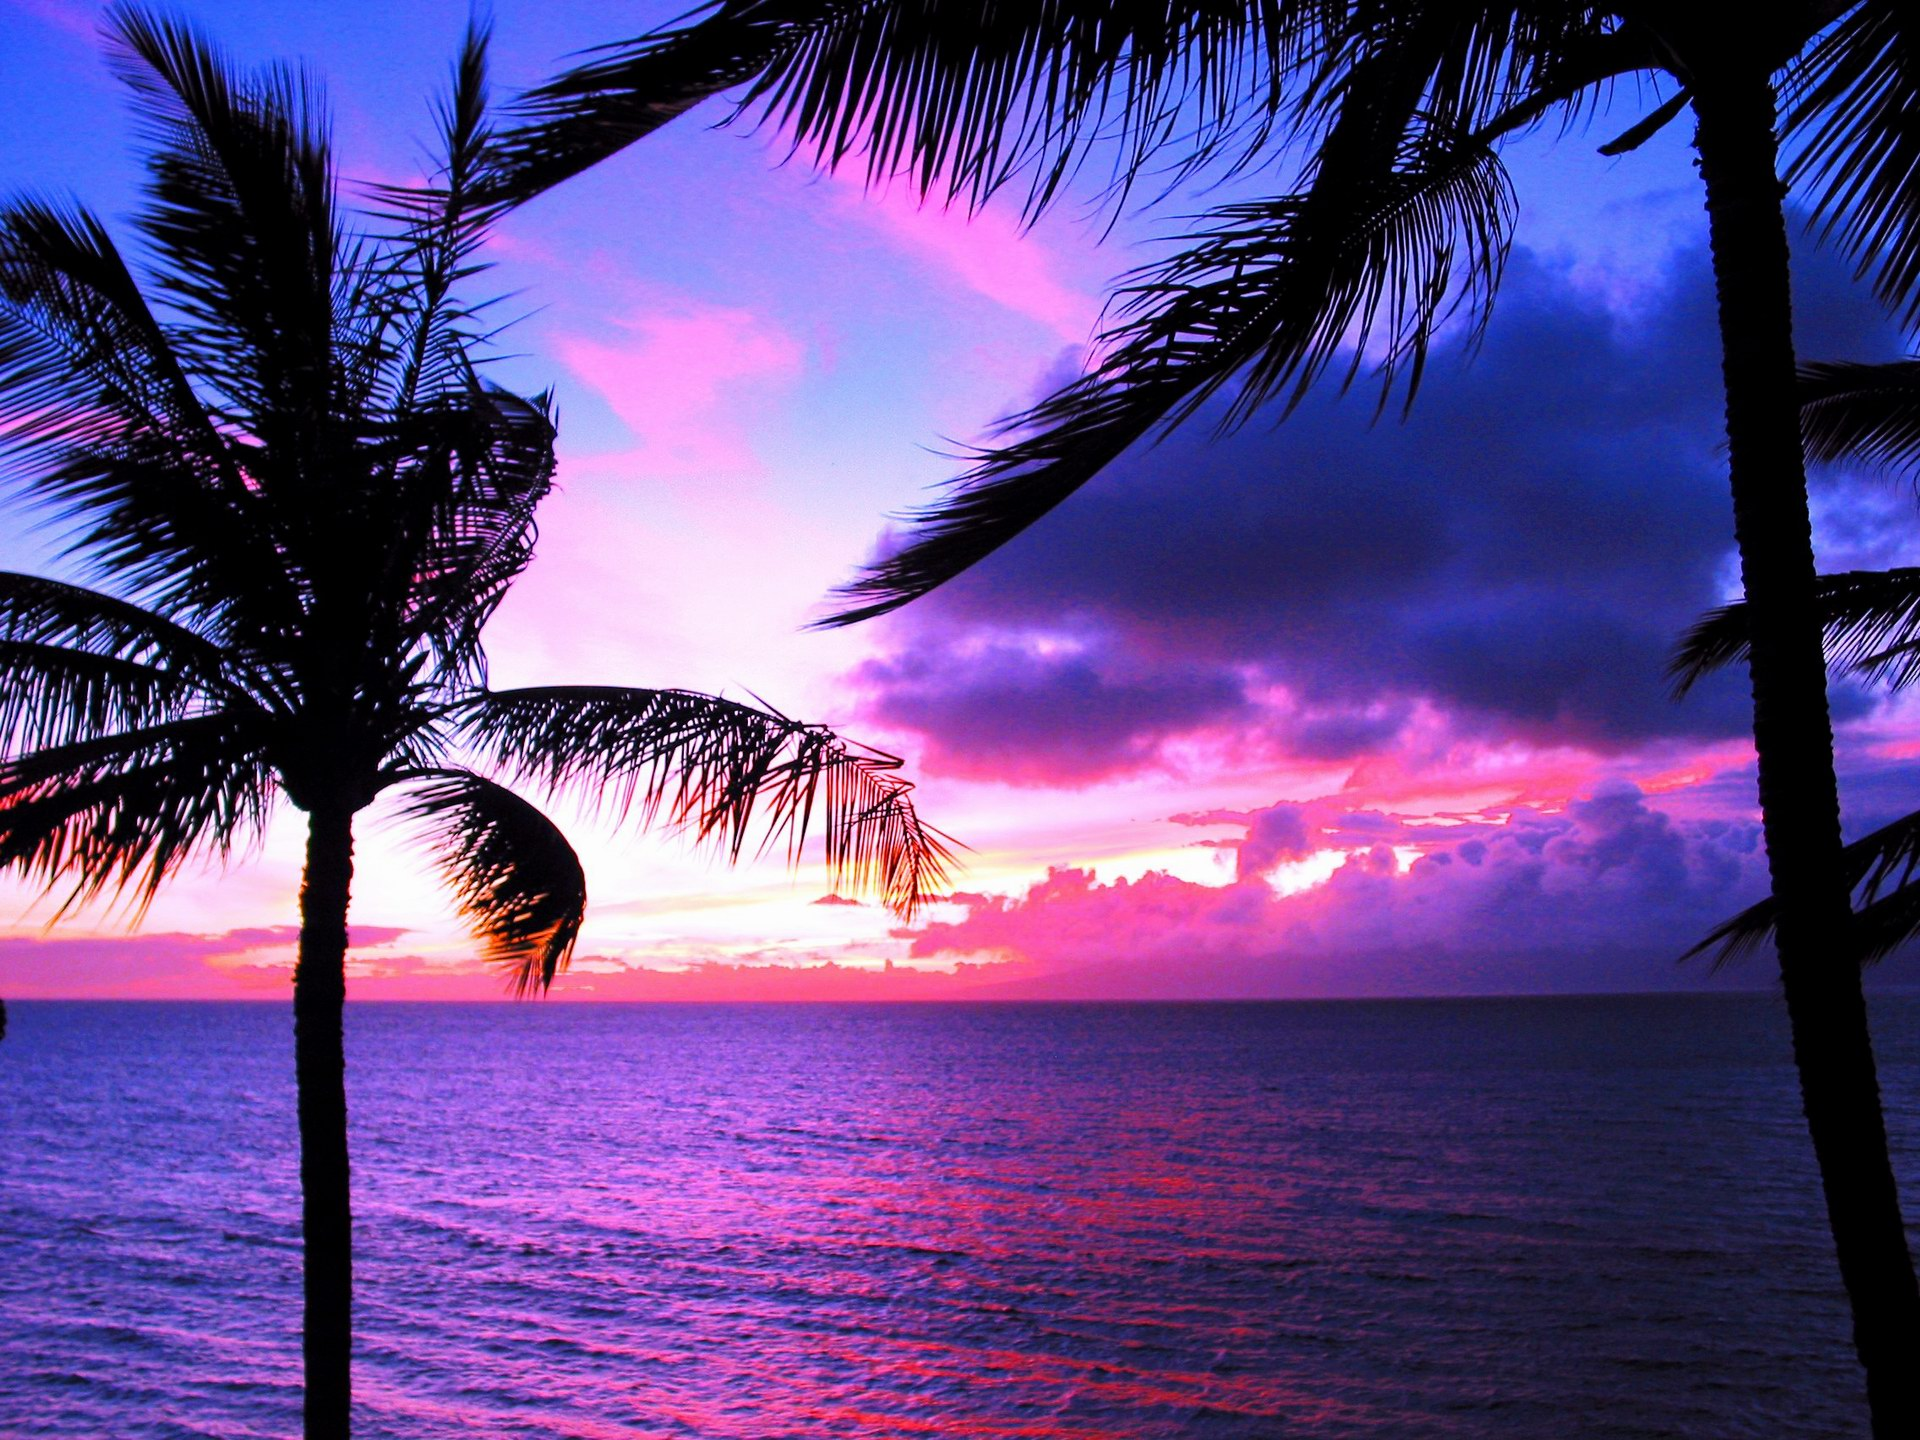 Nature Hawaii Wallpapers Hd Pixelstalk Hawaii Surf Wallpaper